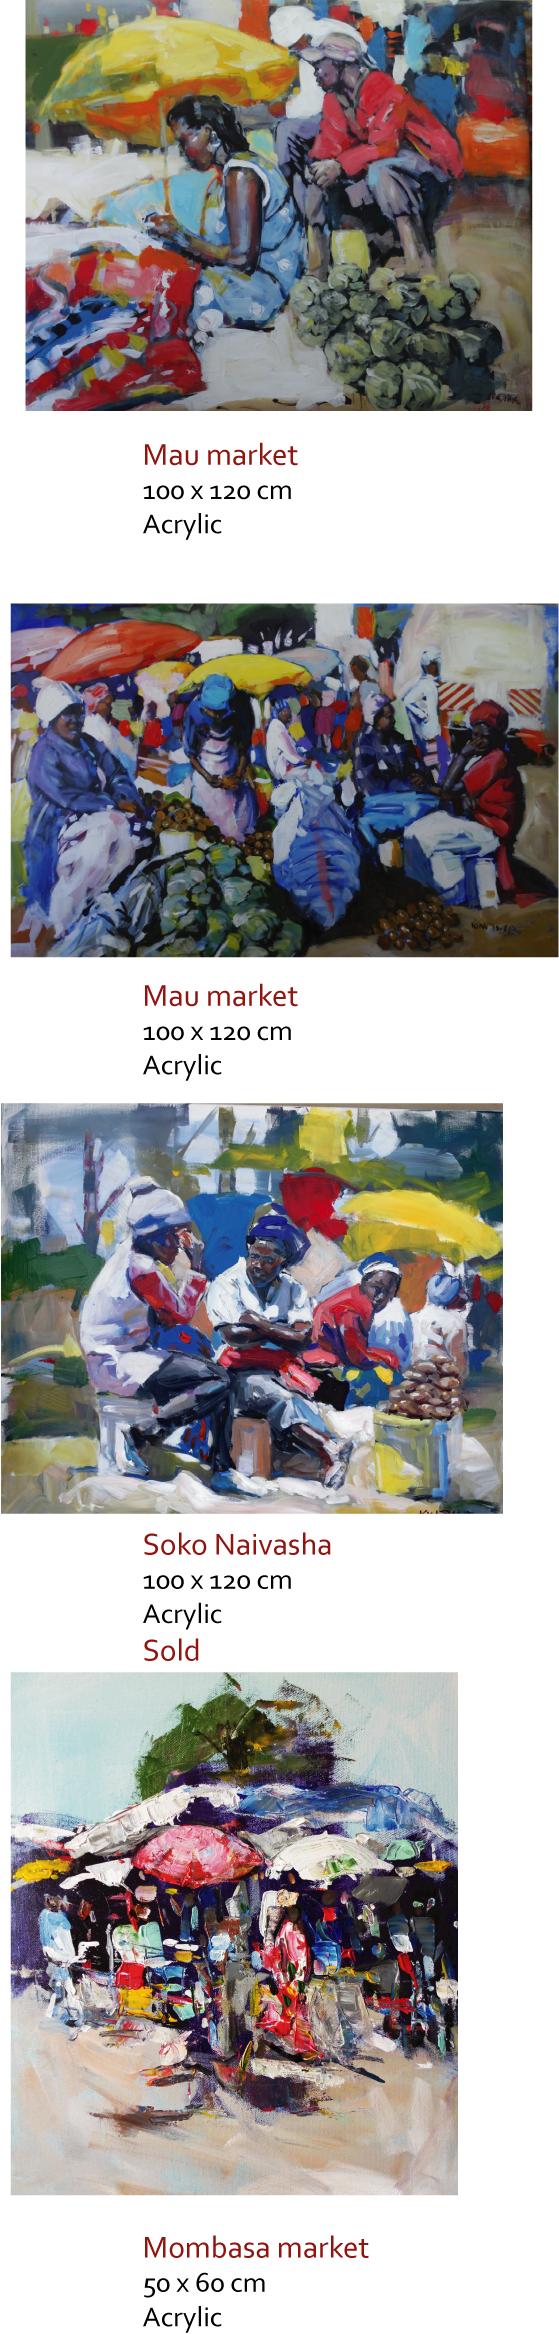 market-scene.png